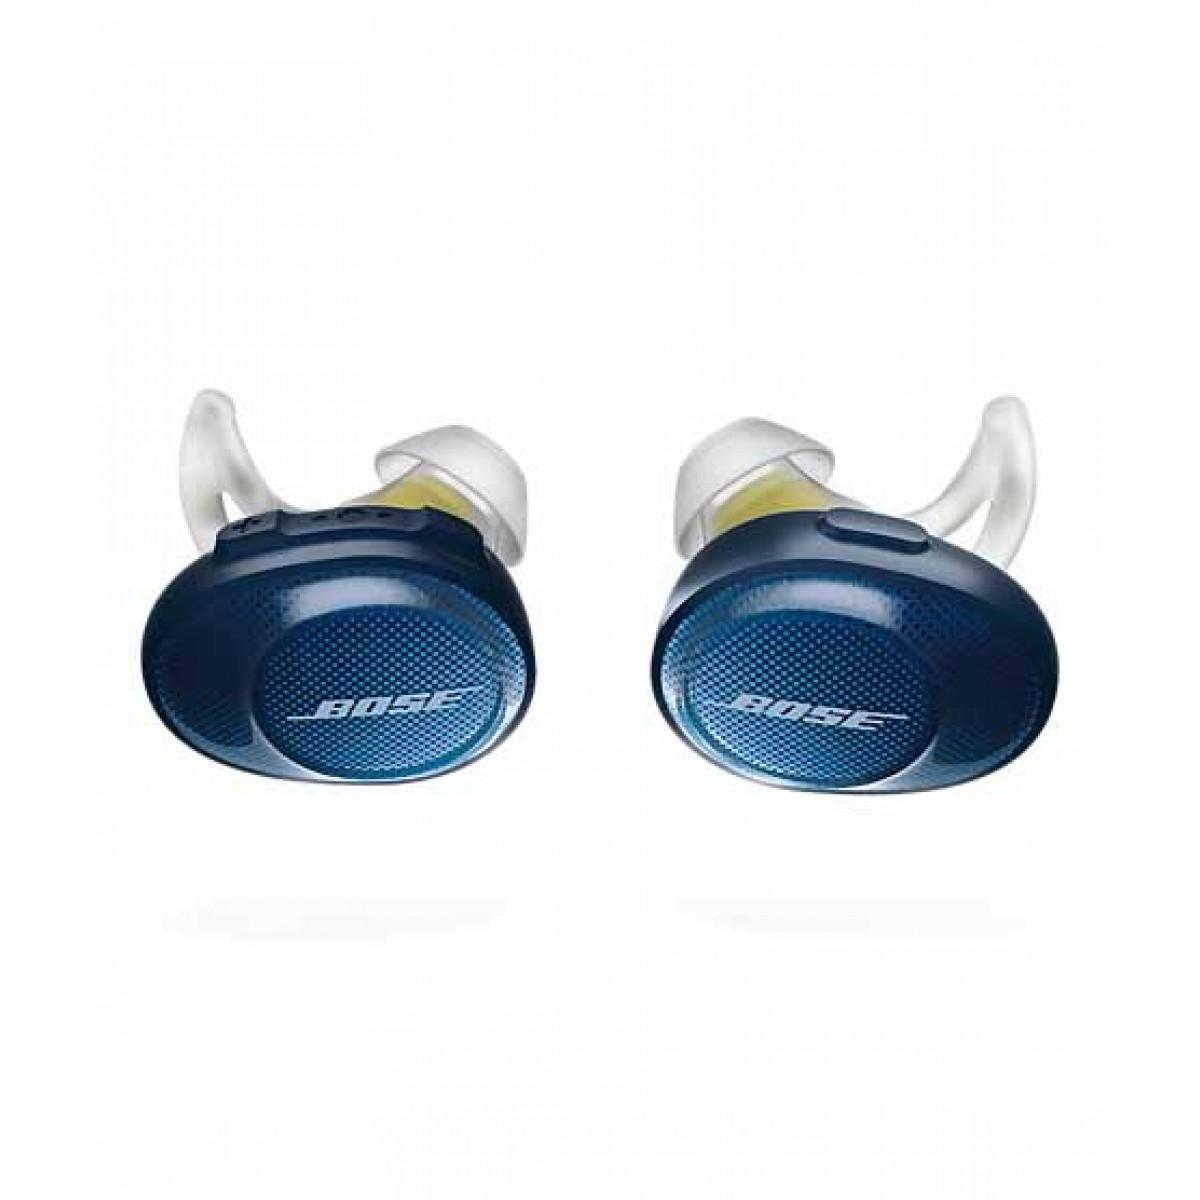 b2623804c8f Bose SoundSport Free Wireless Earbuds Price in Pakistan | Buy Bose Wireless  Earbuds Midnight Blue | iShopping.pk